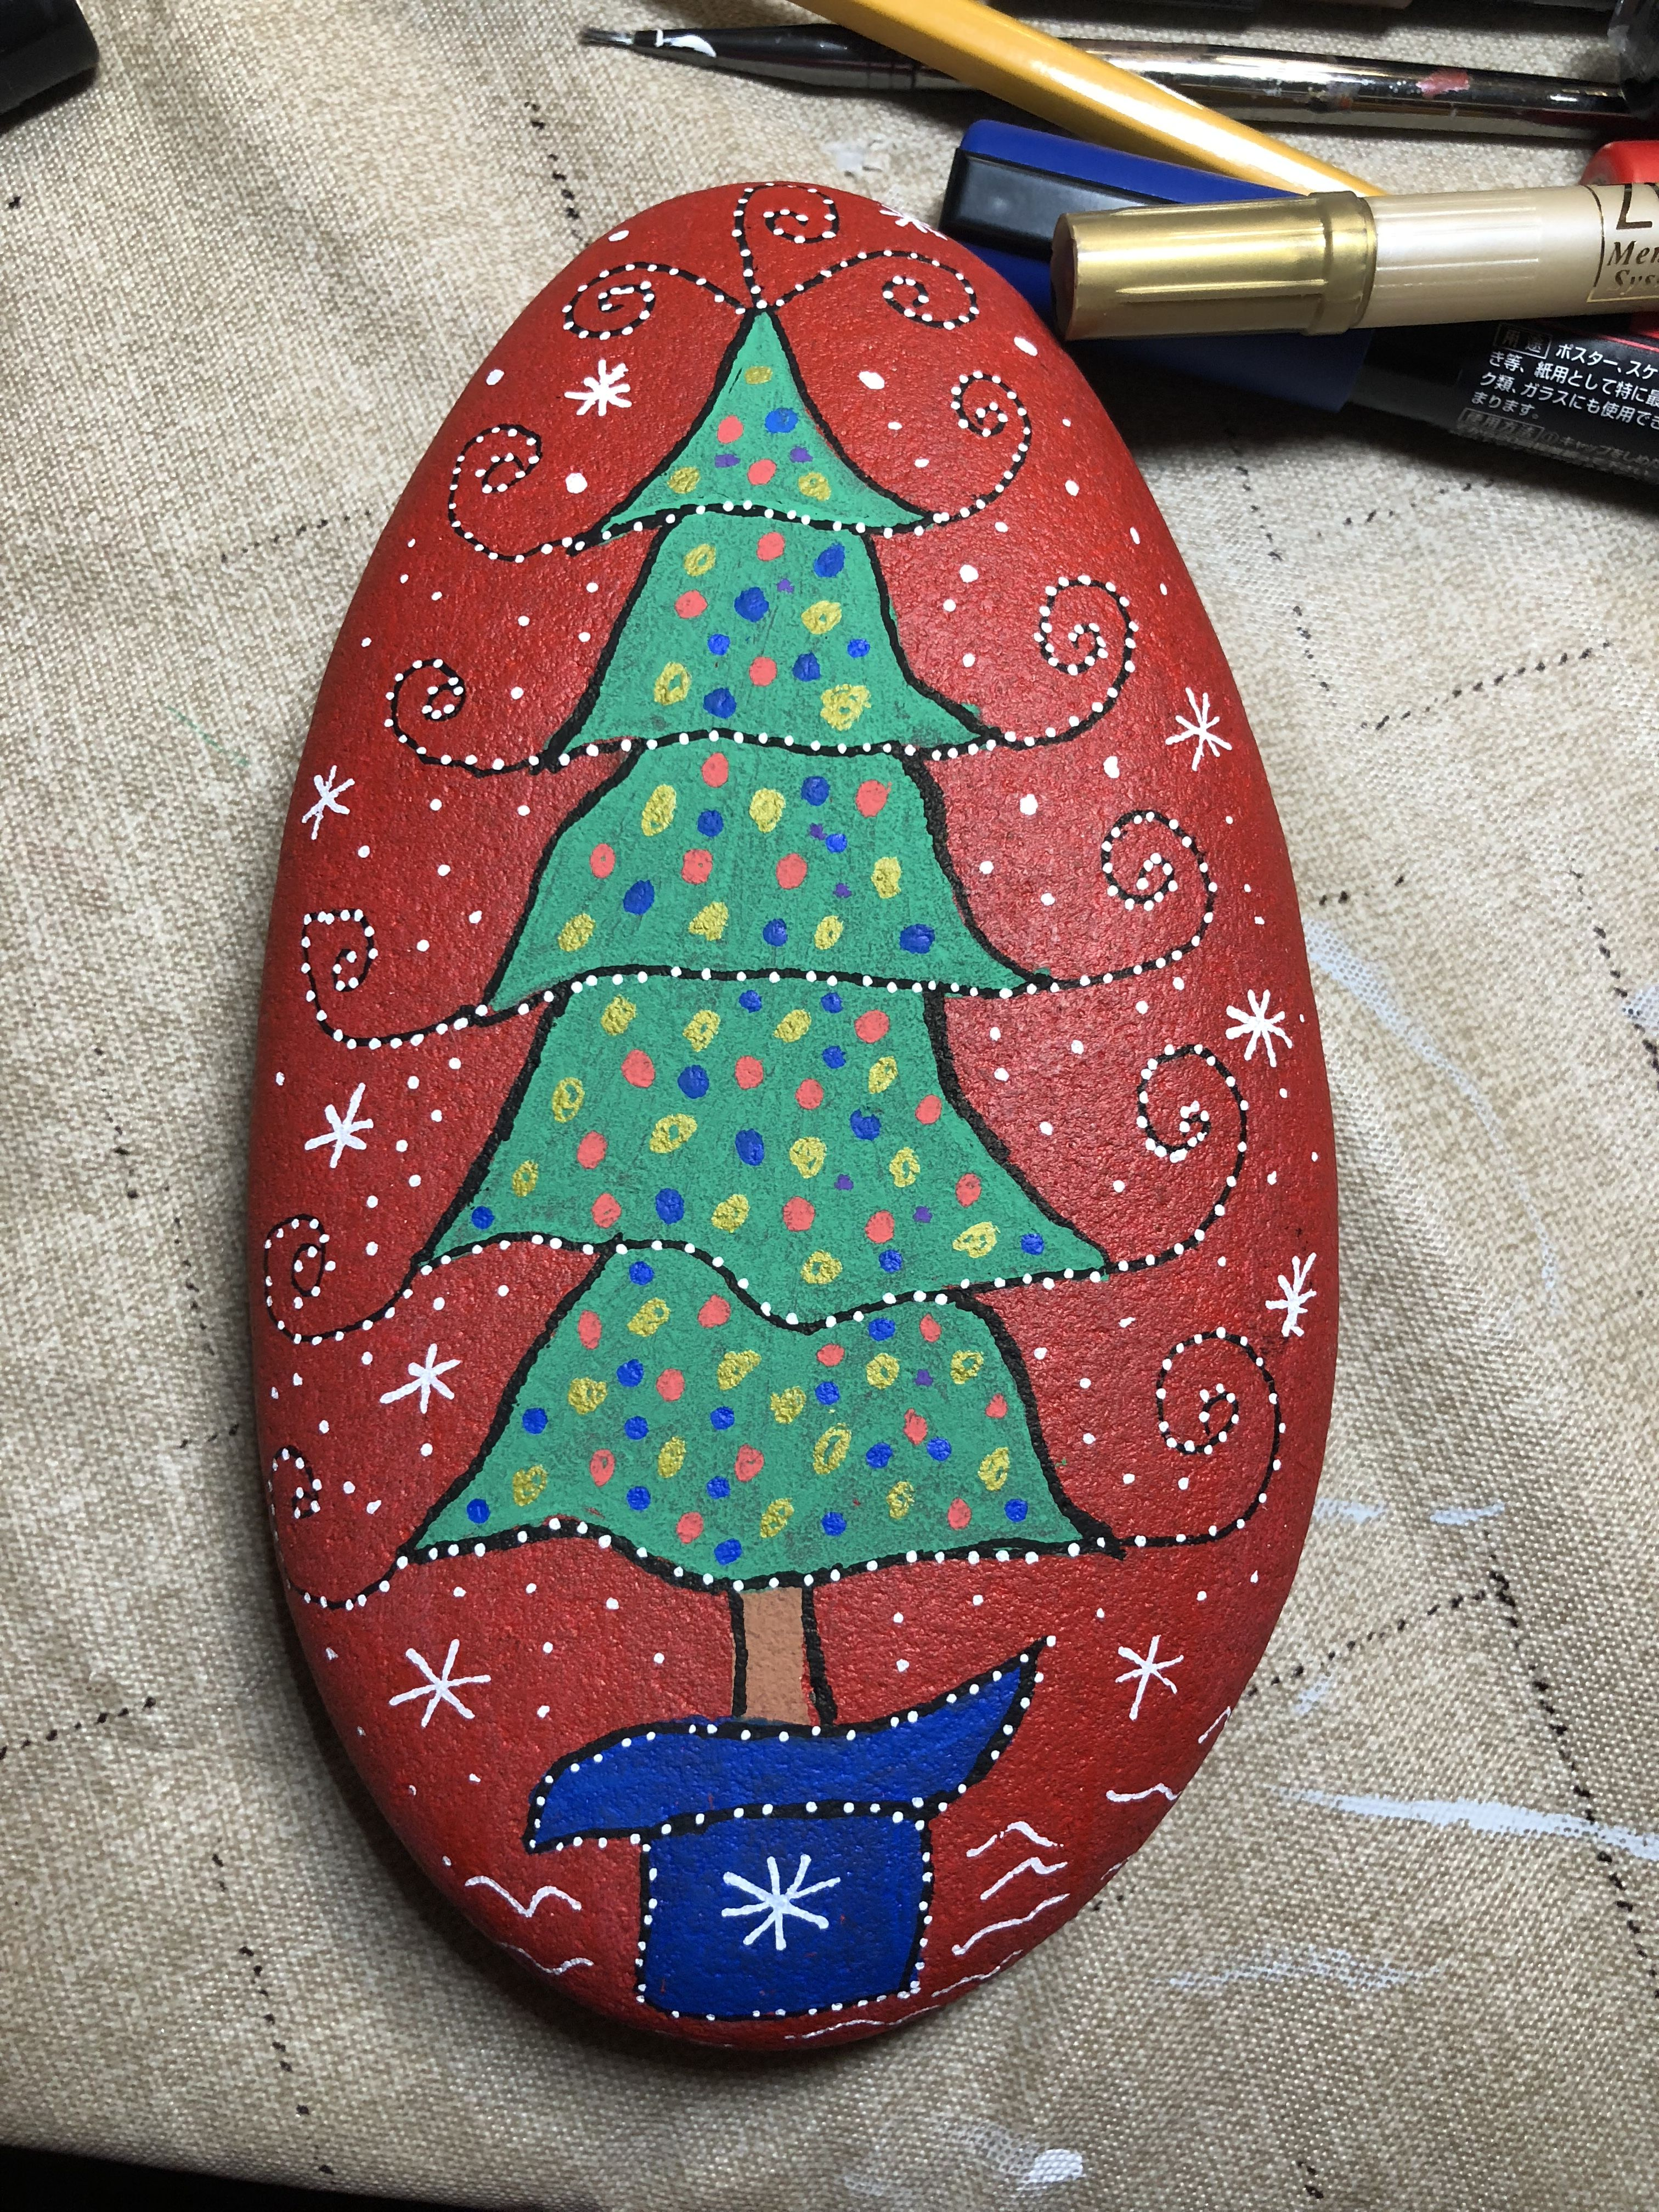 Christmas Tree Painted Rock Rock Painting Designs Painted Rocks Rock Crafts